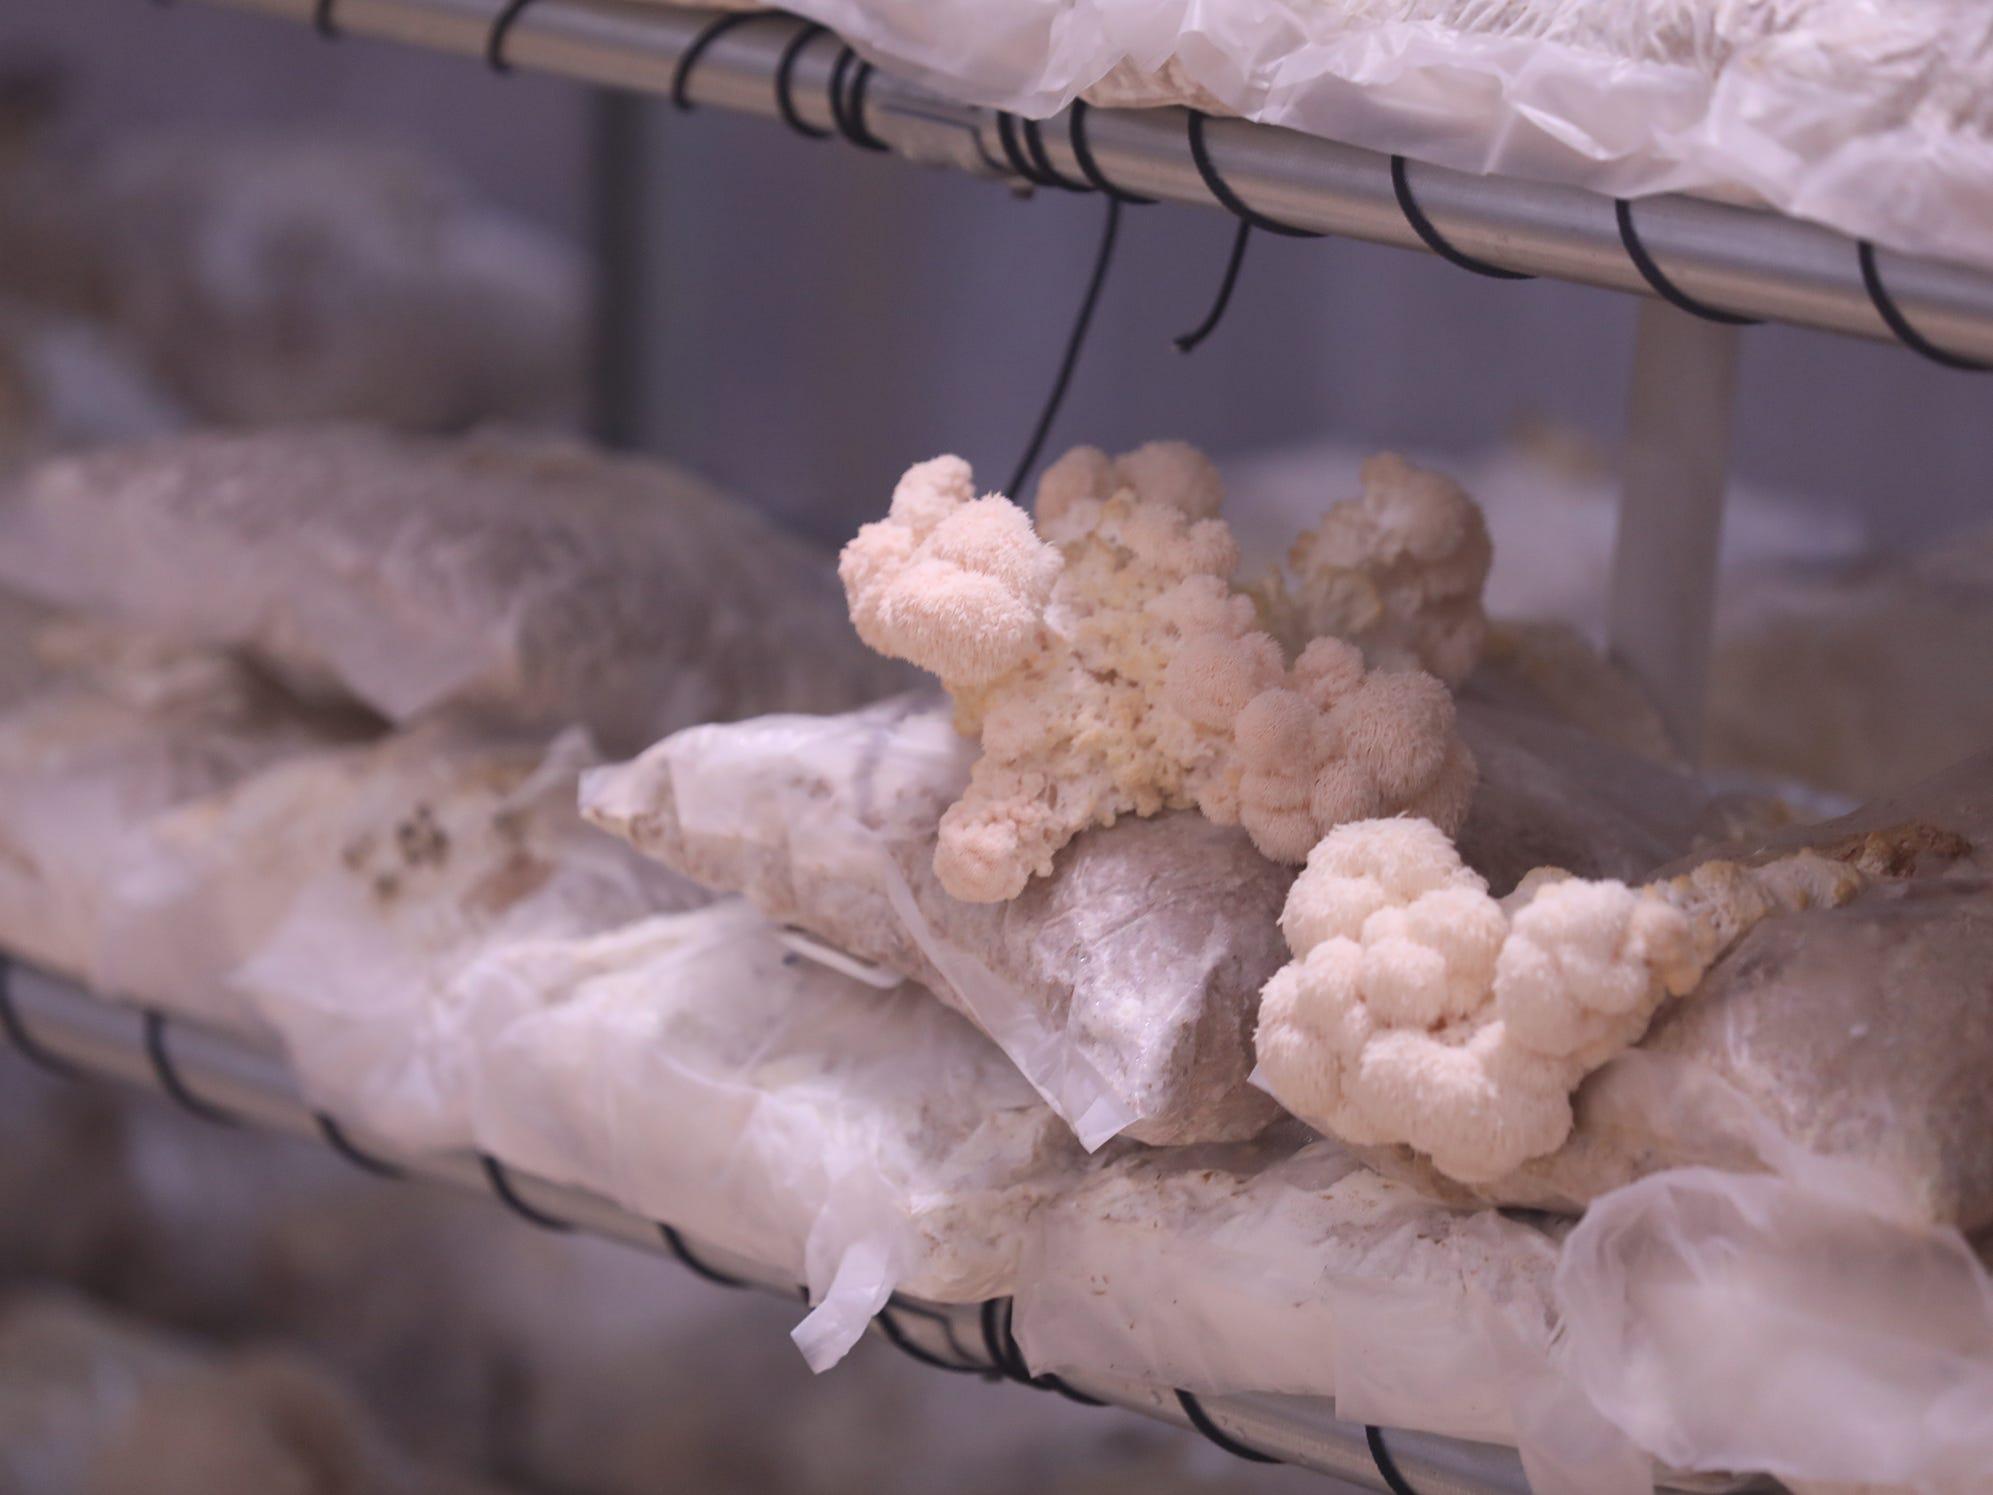 Lion's Mane mushrooms burst through their grow bag.